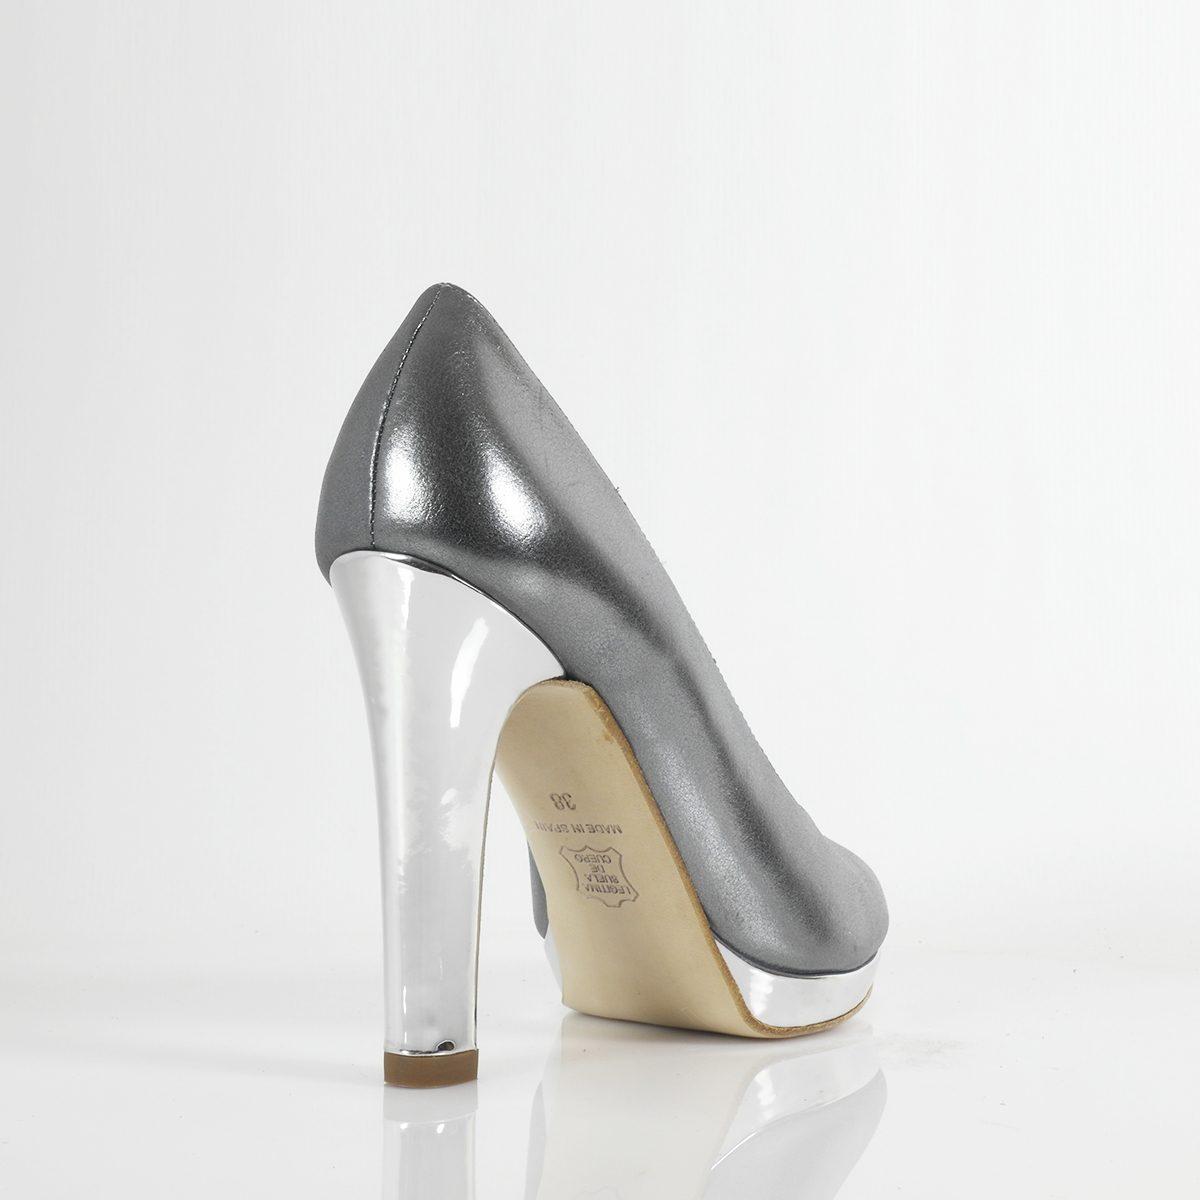 SALON MOD.1940 (10,5cm) - Zapatos Personalizados Fiesta